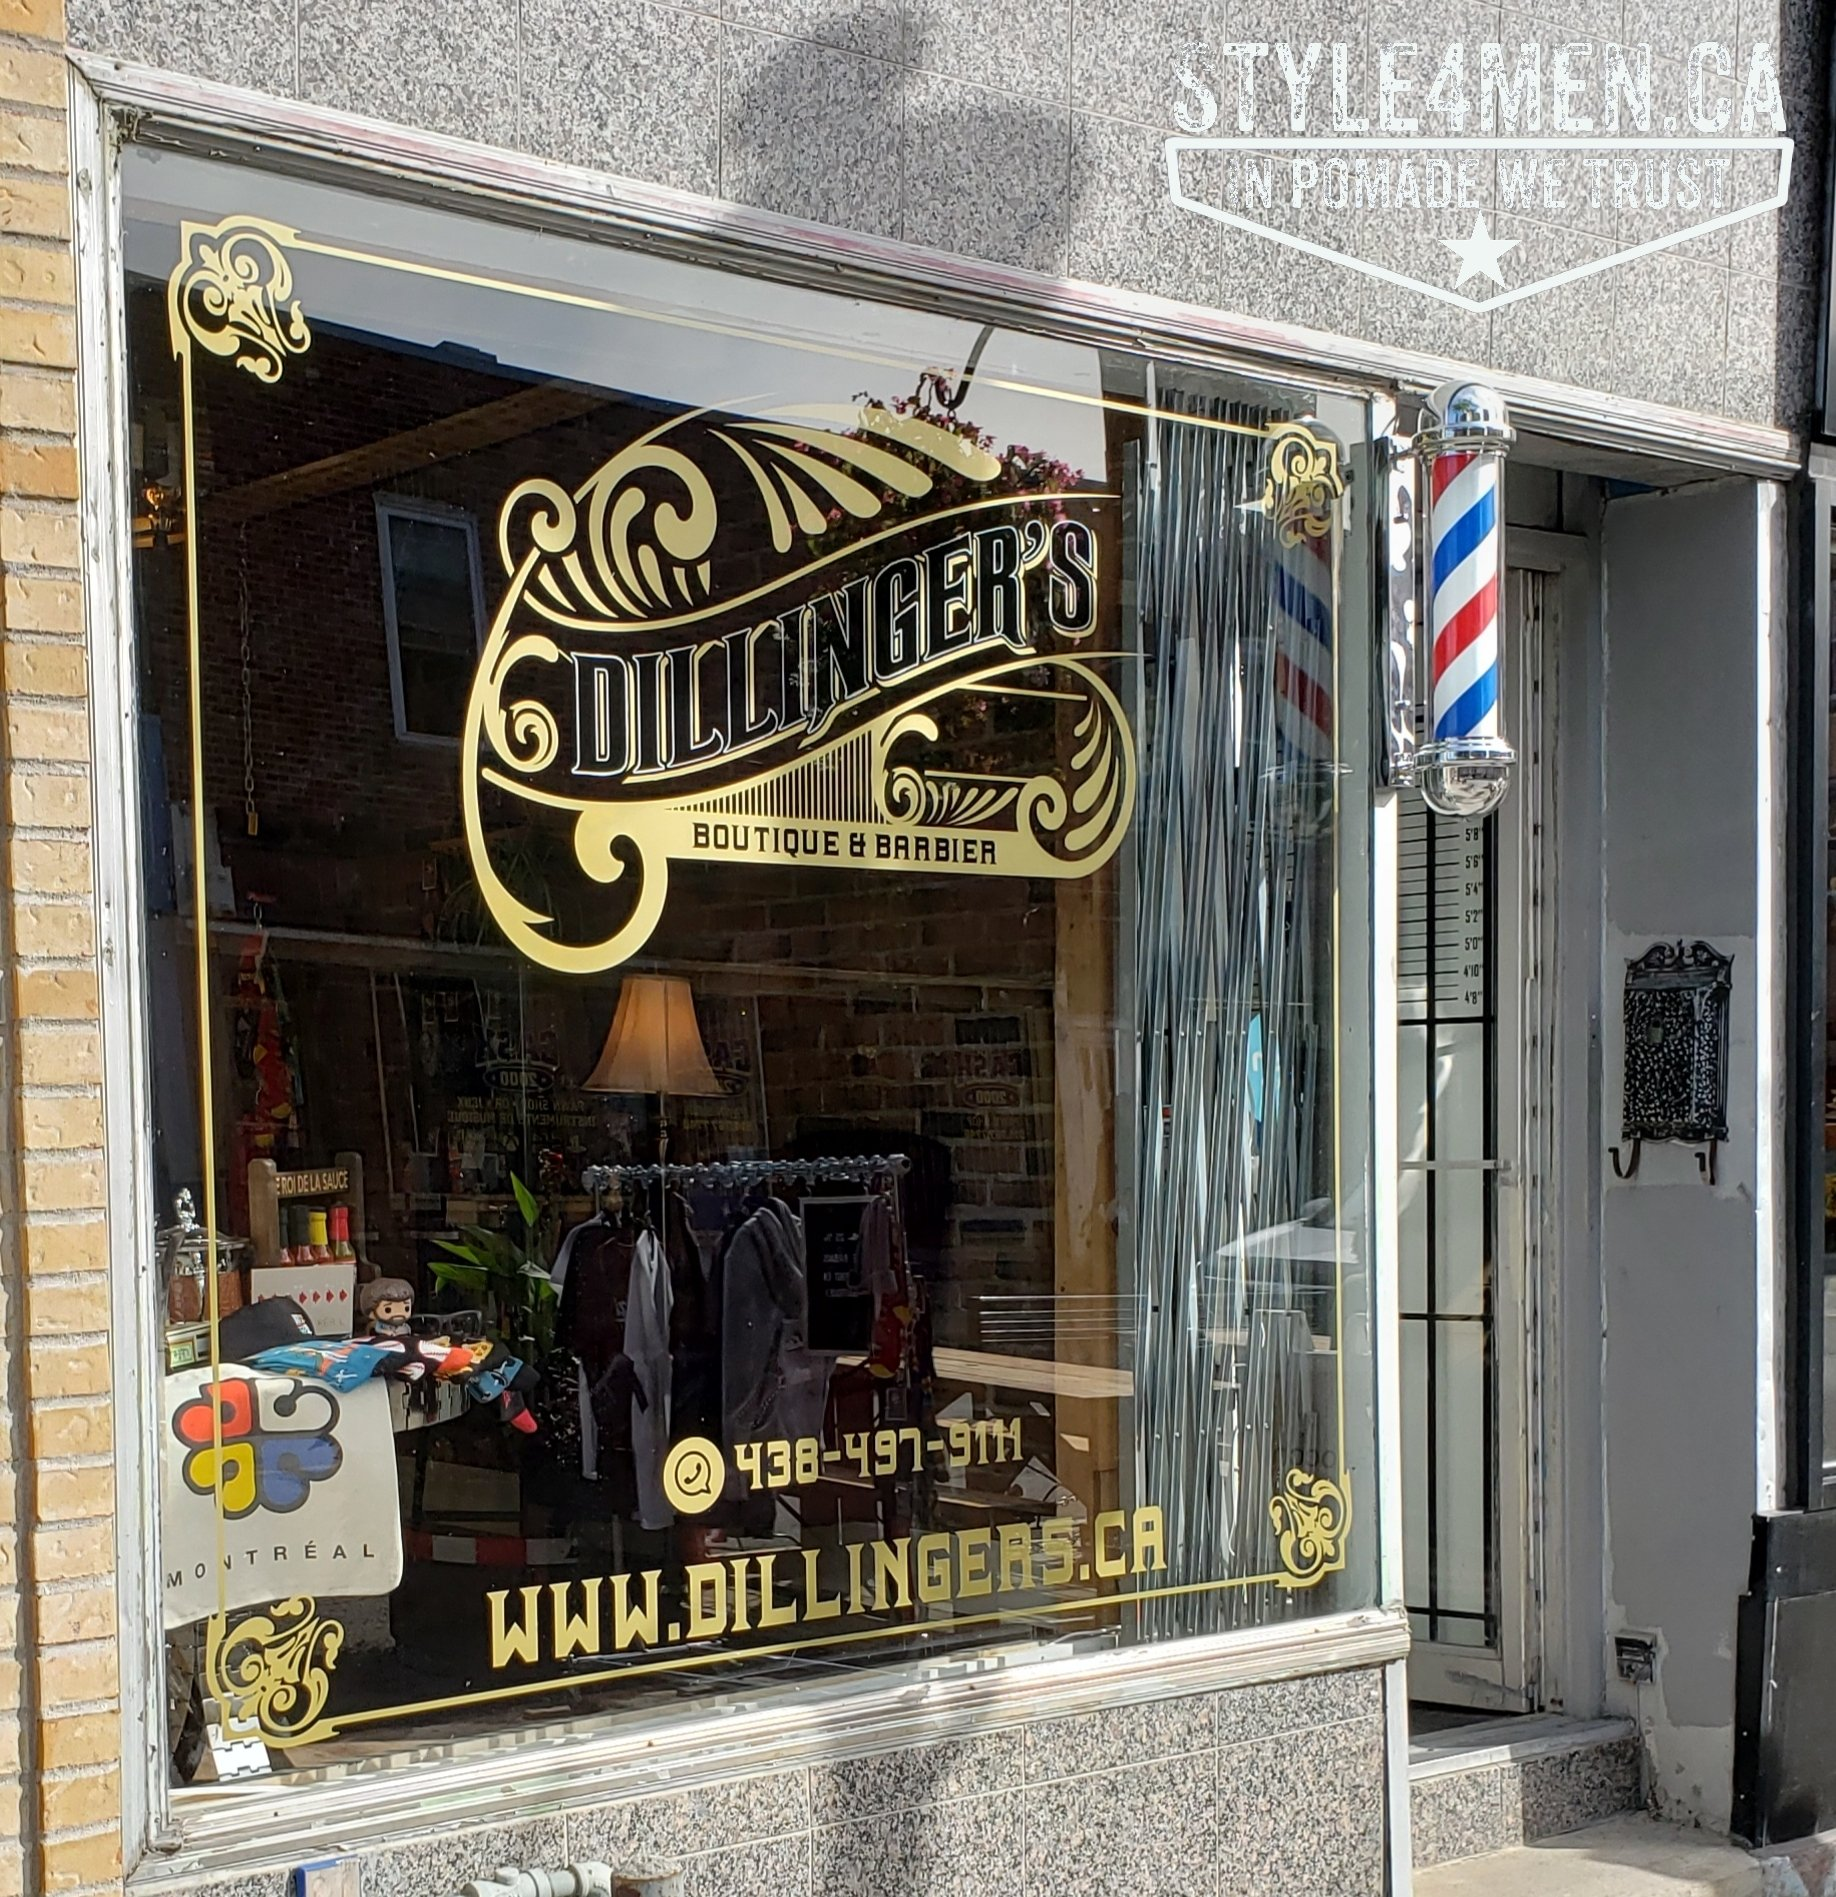 A visit at Dillinger's Barber & Boutique in Montreal